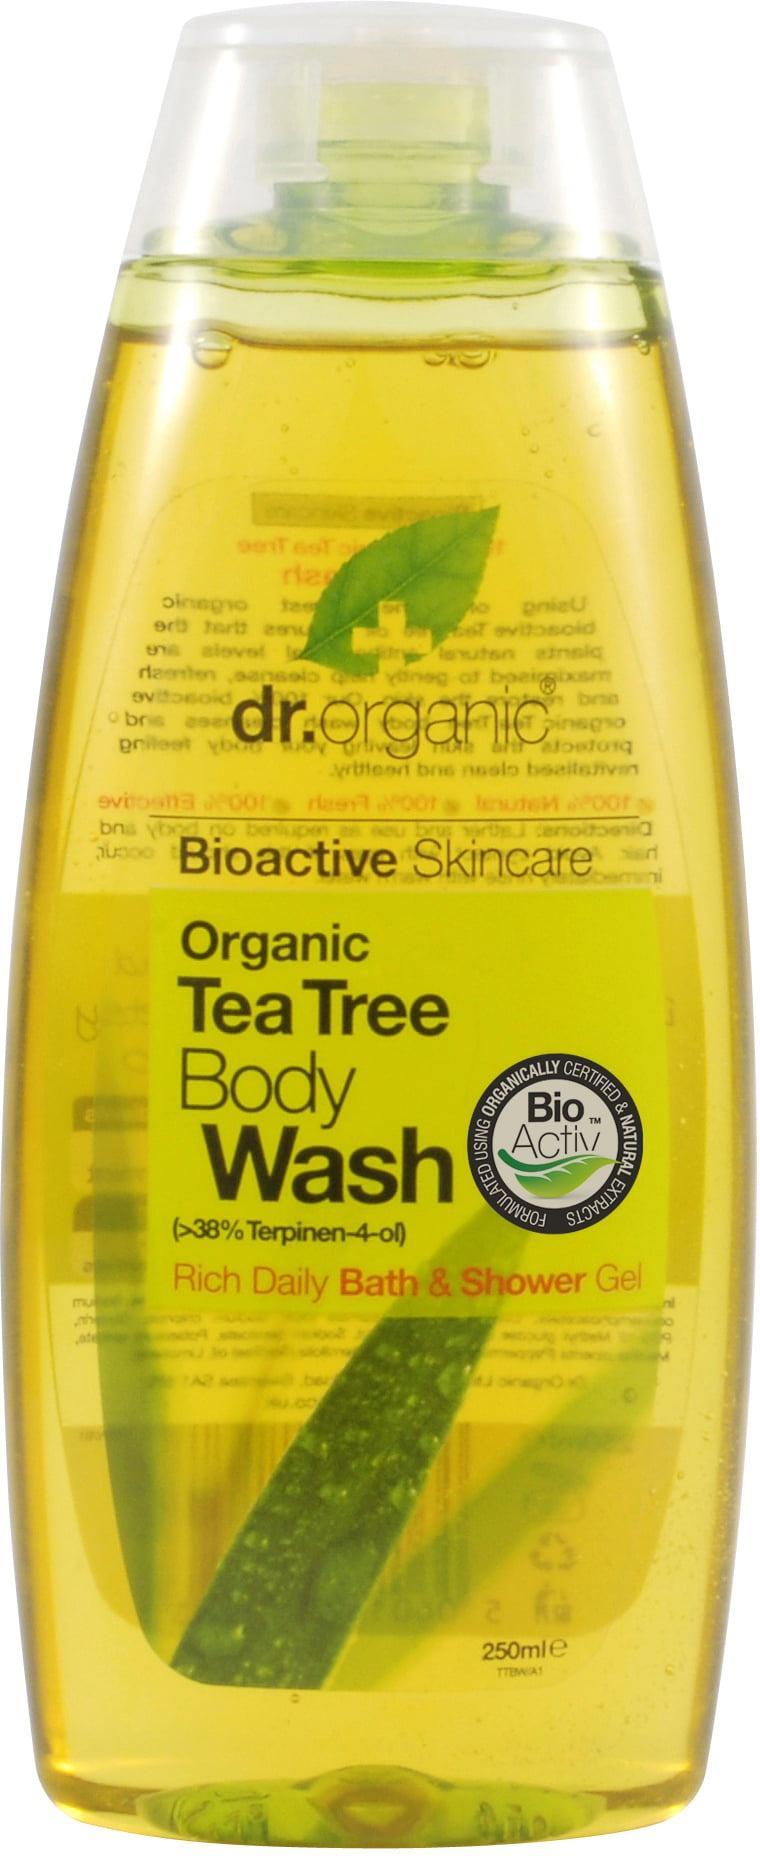 Dr Organic Tea Tree Body Wash